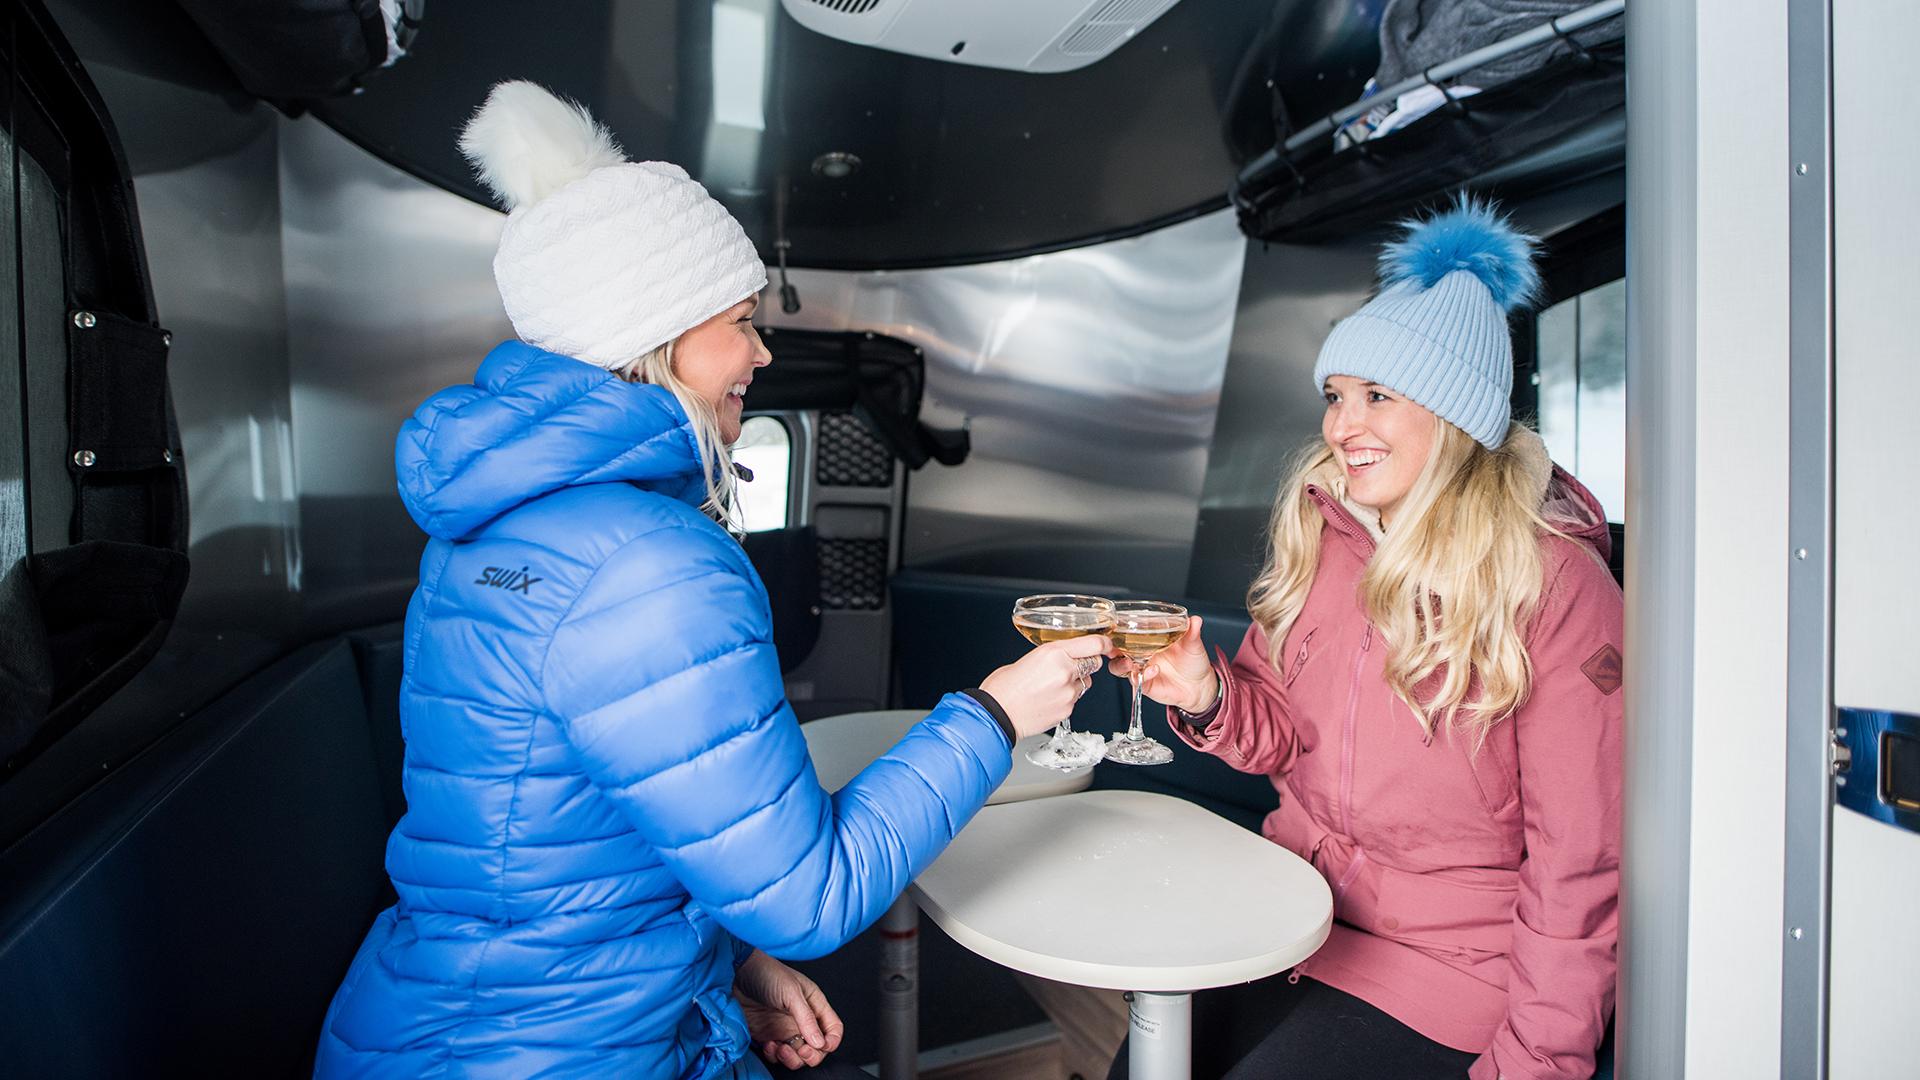 Airstream-Basecamp-winter-camping